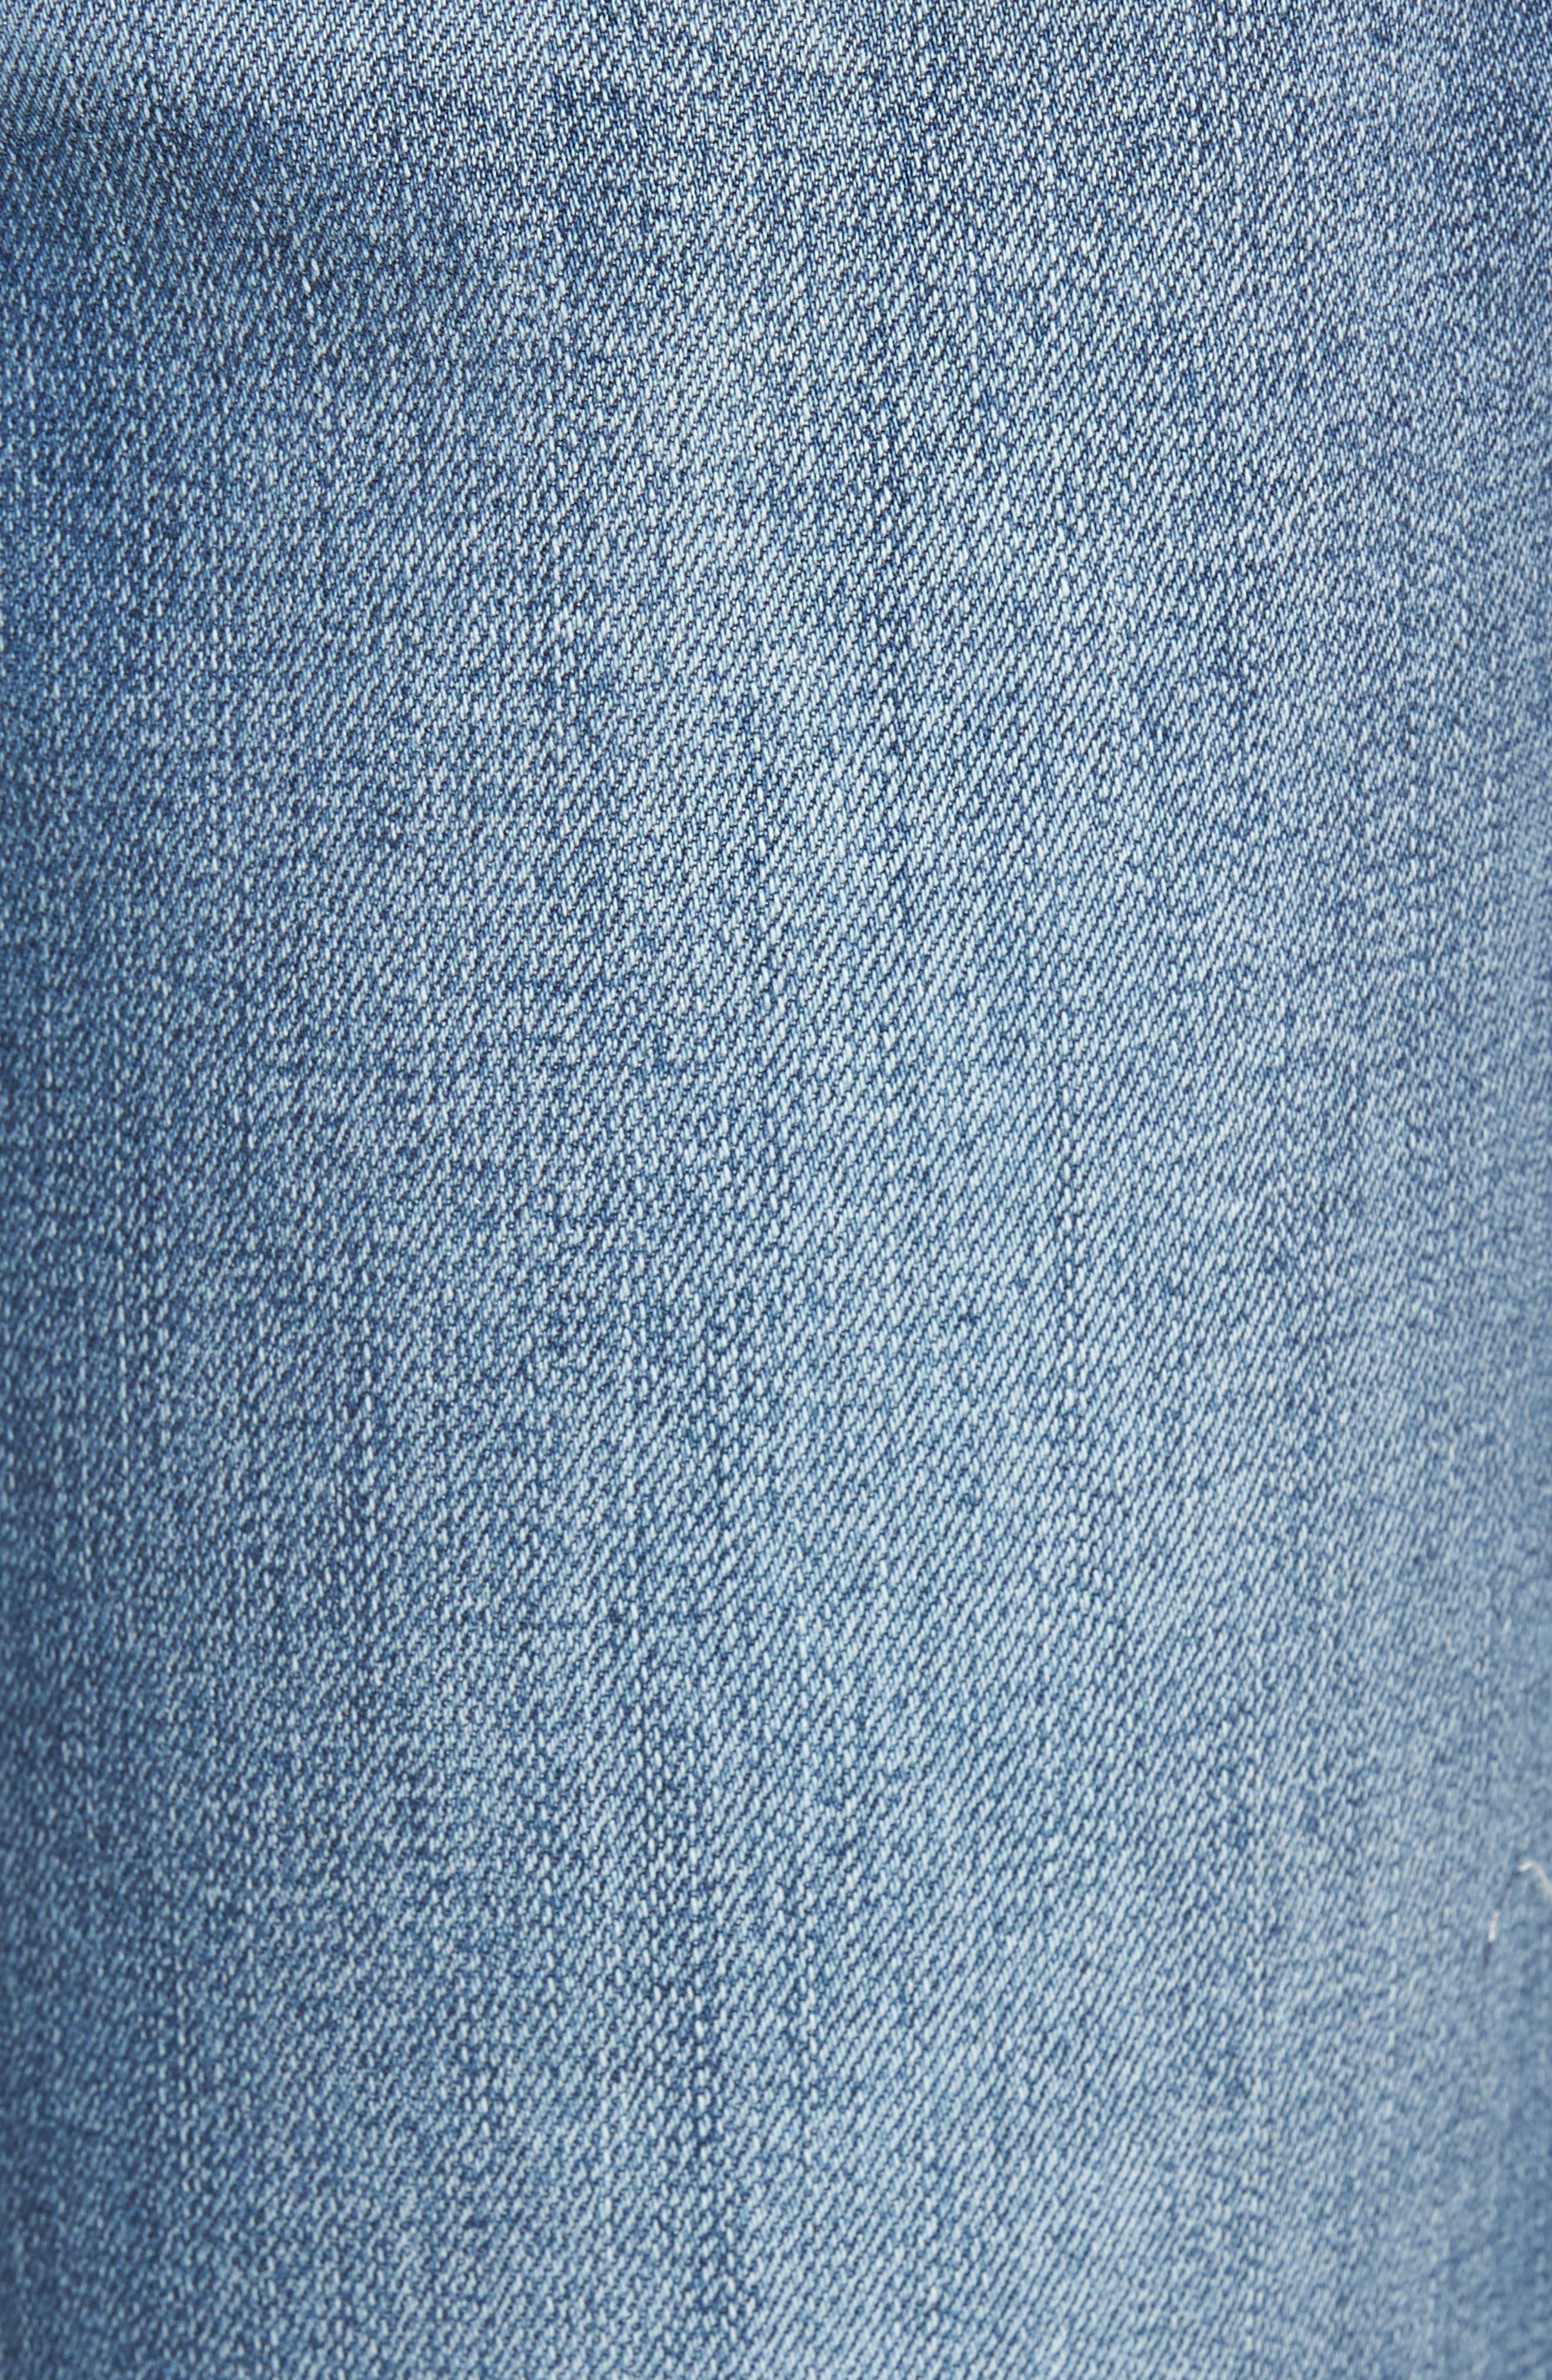 Alternate Image 5  - Wit & Wisdom Embroidered Slim Crop Jeans (Nordstrom Exclusive)